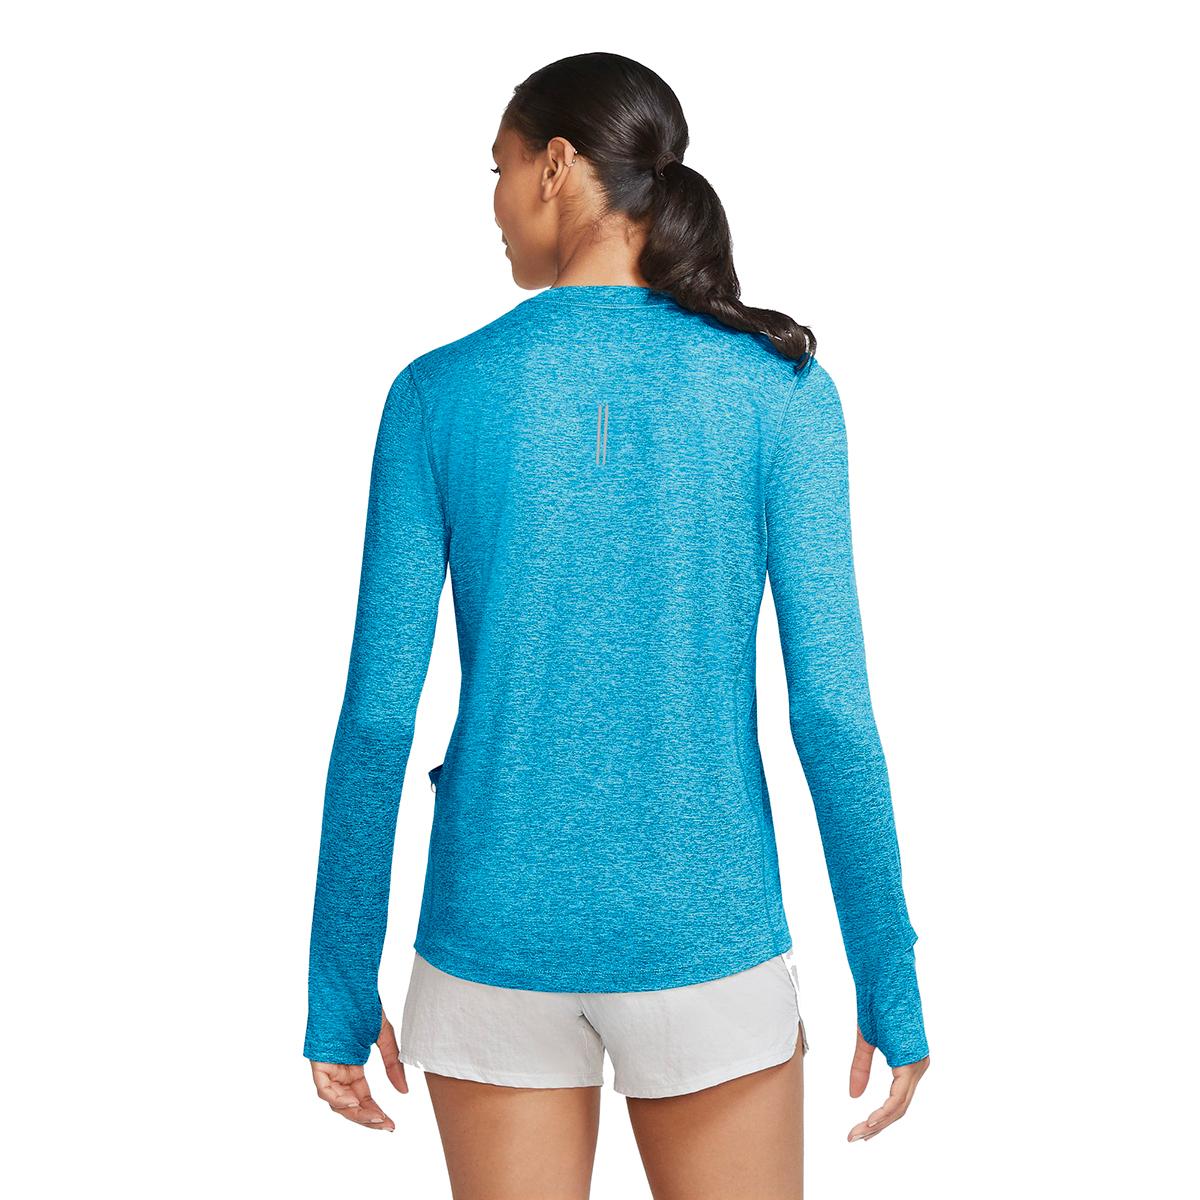 Women's Nike Element Crew Long Sleeve Shirt - Color: Lazer Blue/Glacier Ice - Size: XS, Lazer Blue/Glacier Ice, large, image 2